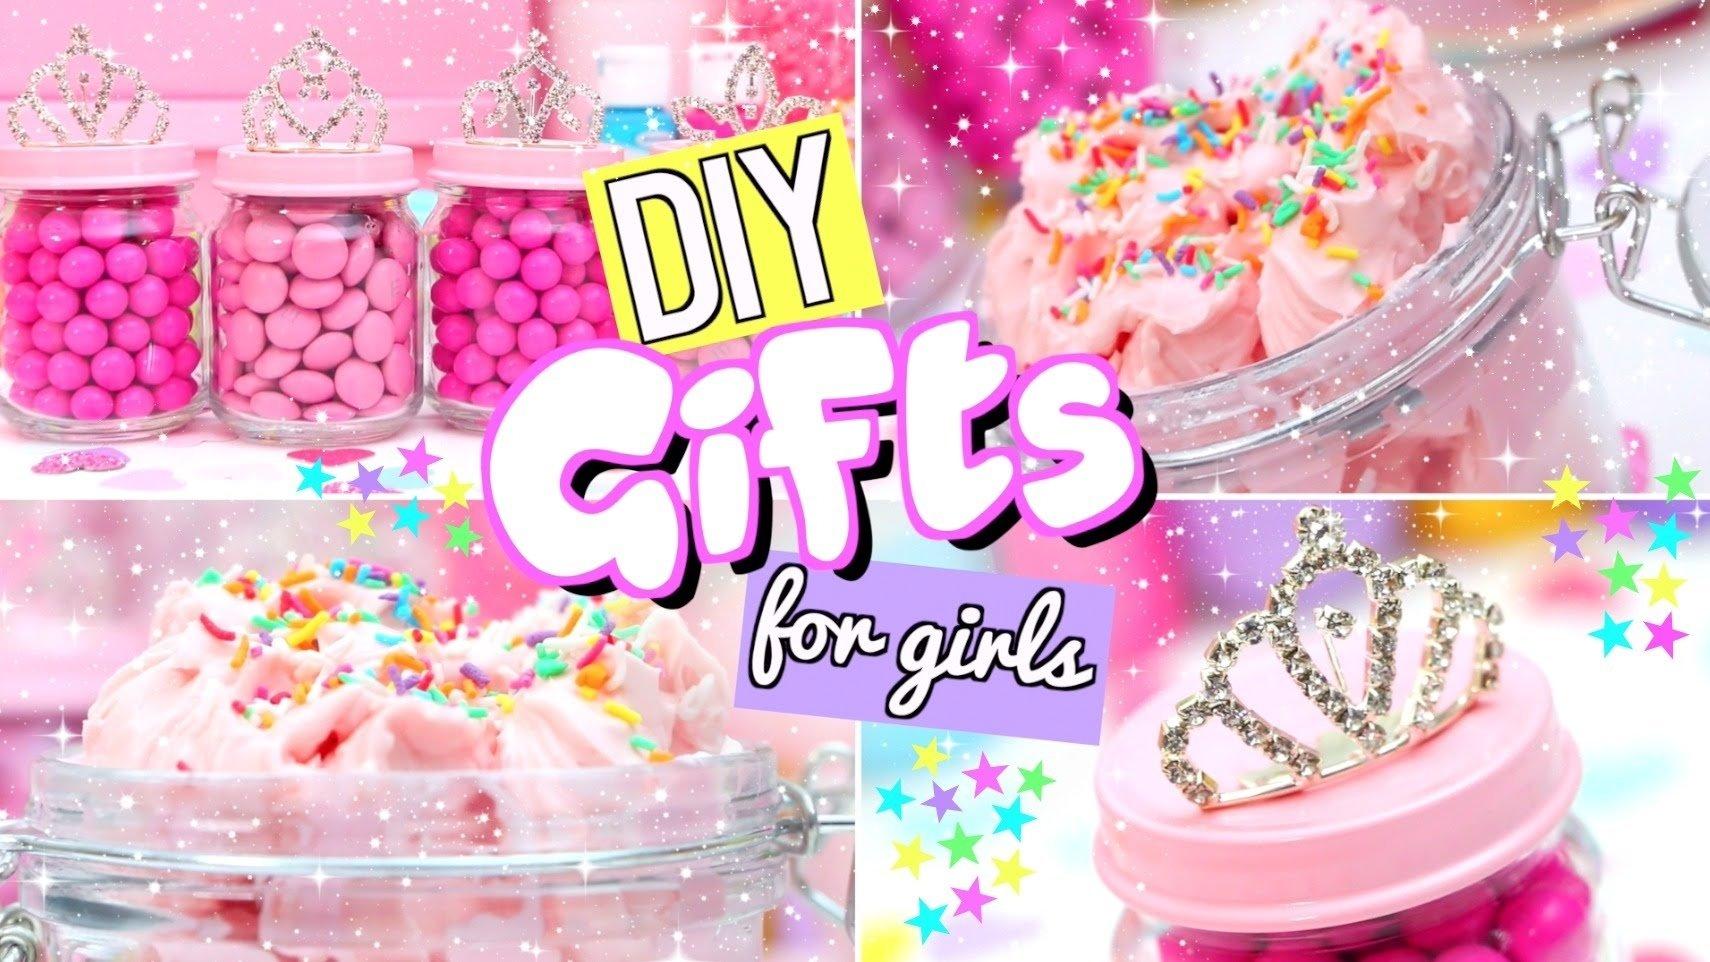 10 Gorgeous Birthday Gift Ideas For Sister diy gifts for her gift ideas for friends mom sister teacher diy 2021